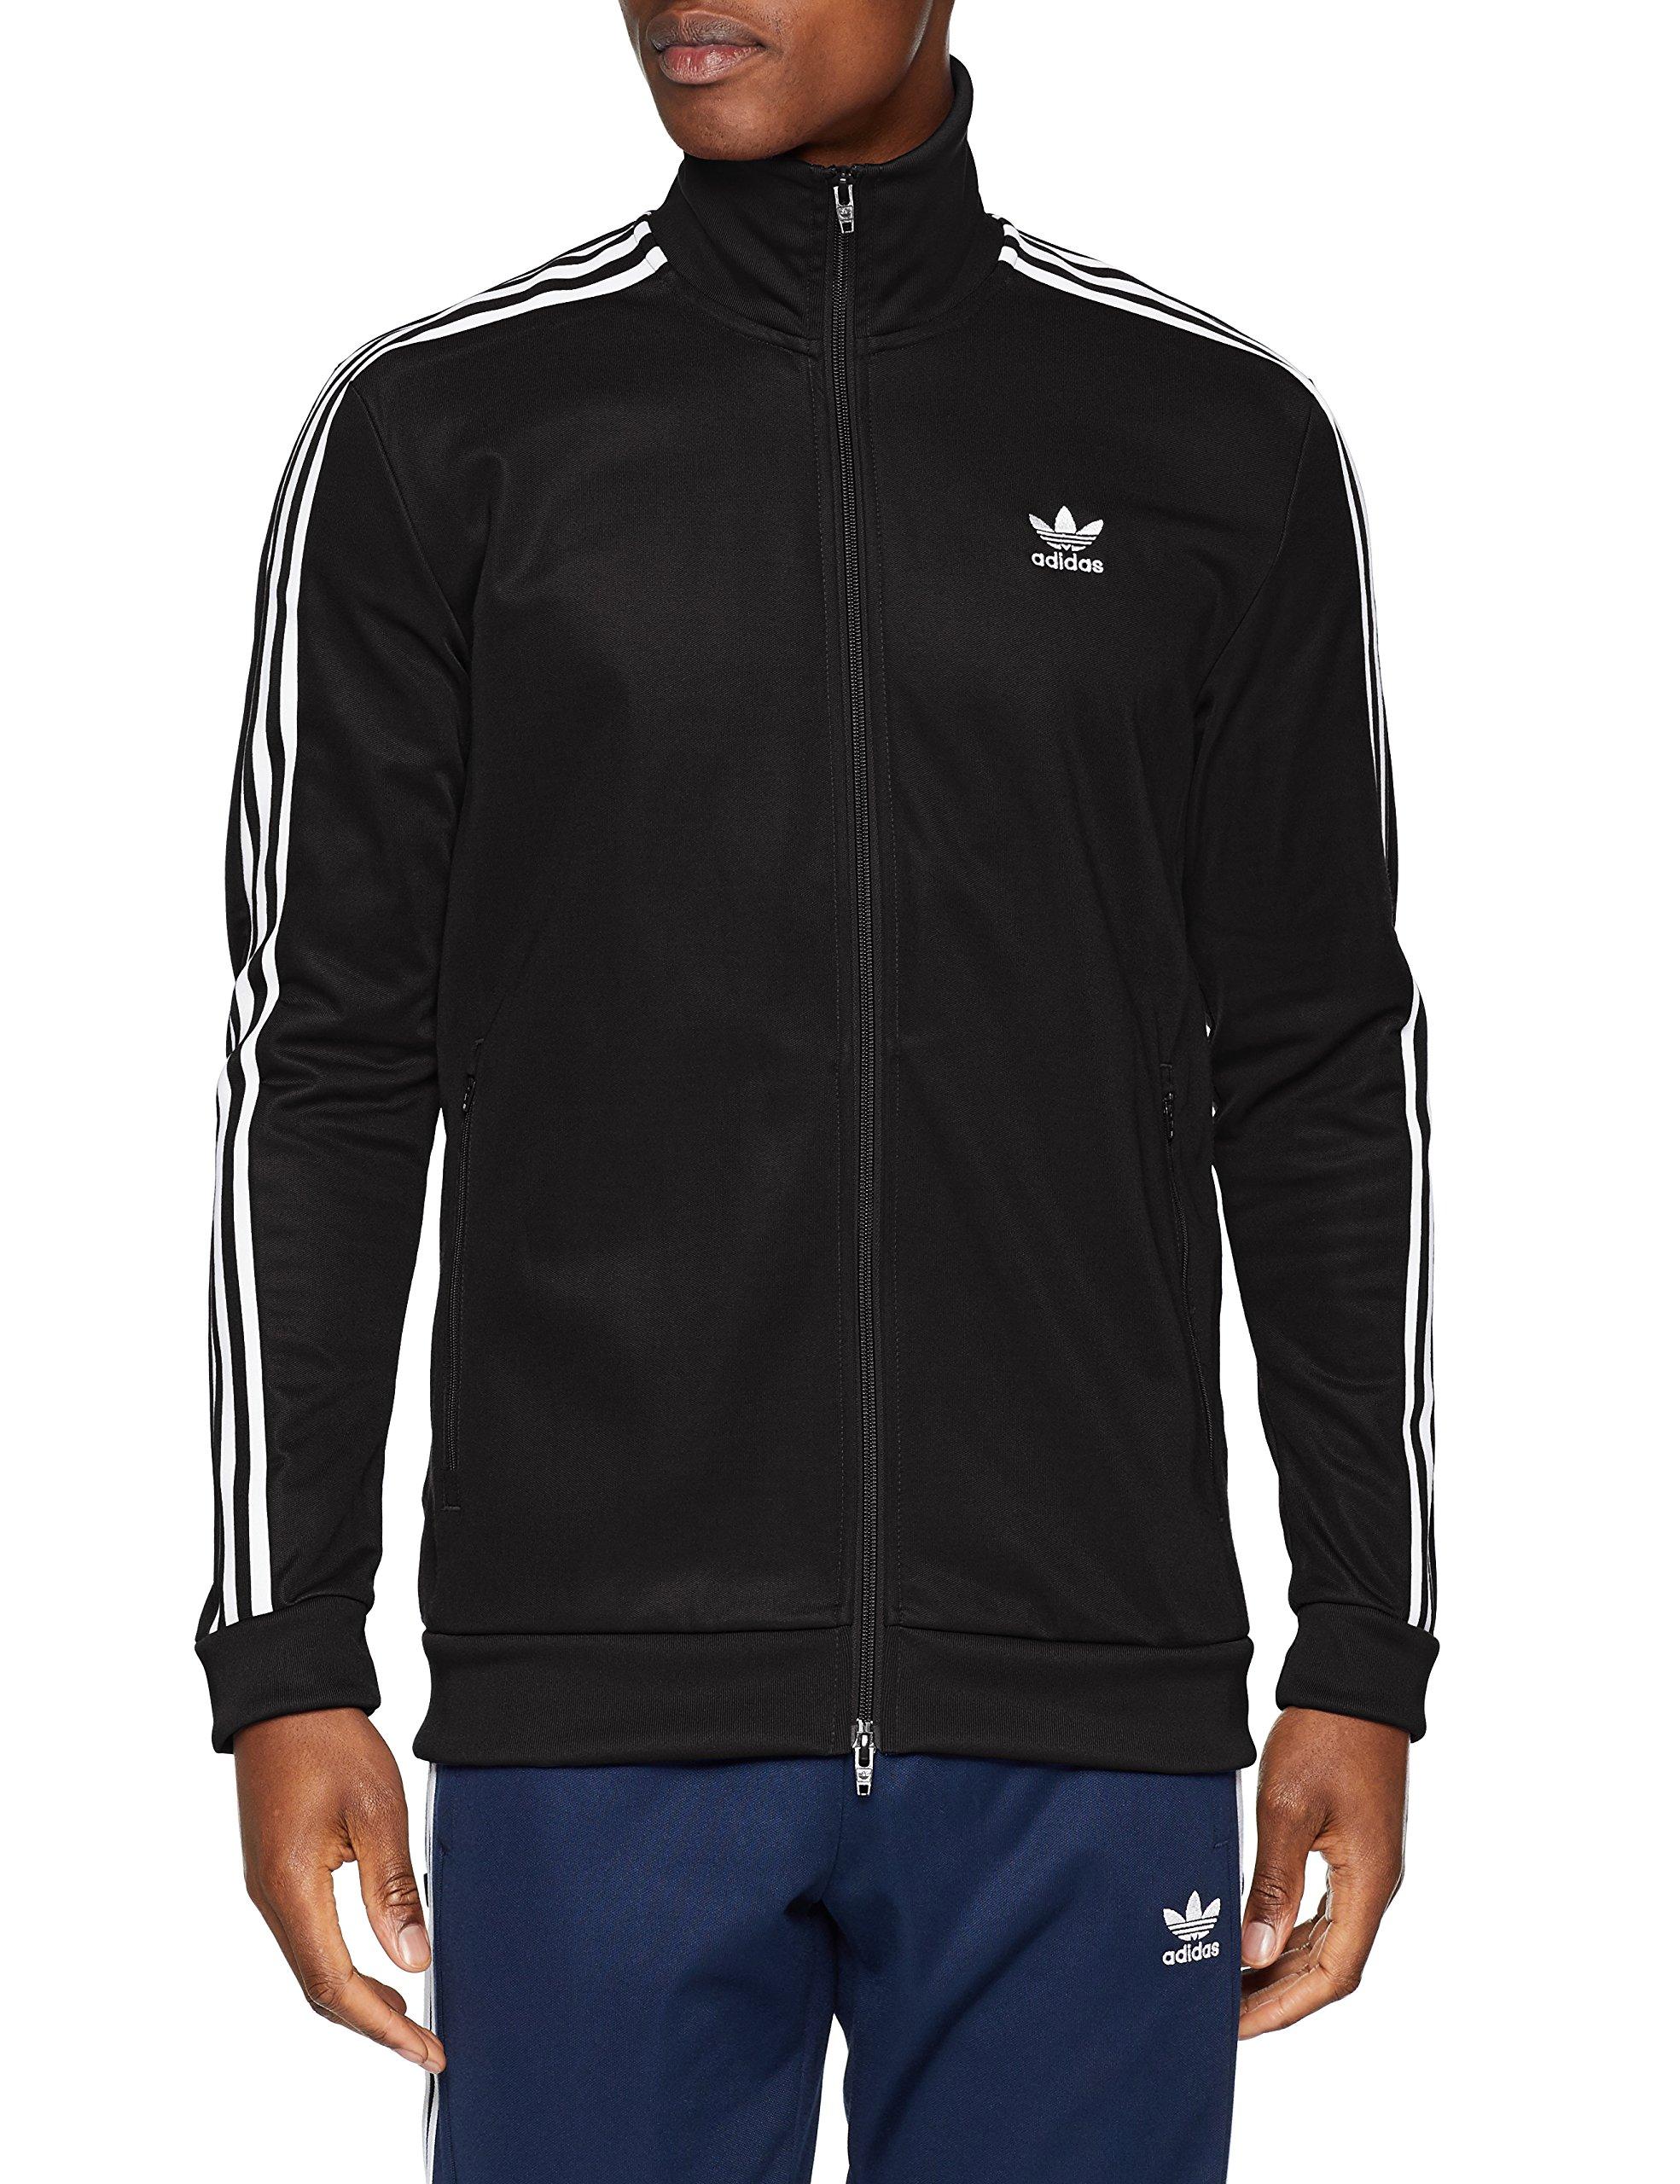 Giacca Ebay Tuta Beckenbauer Nero Adidas Tt Uomo Xxl wq6ZCv